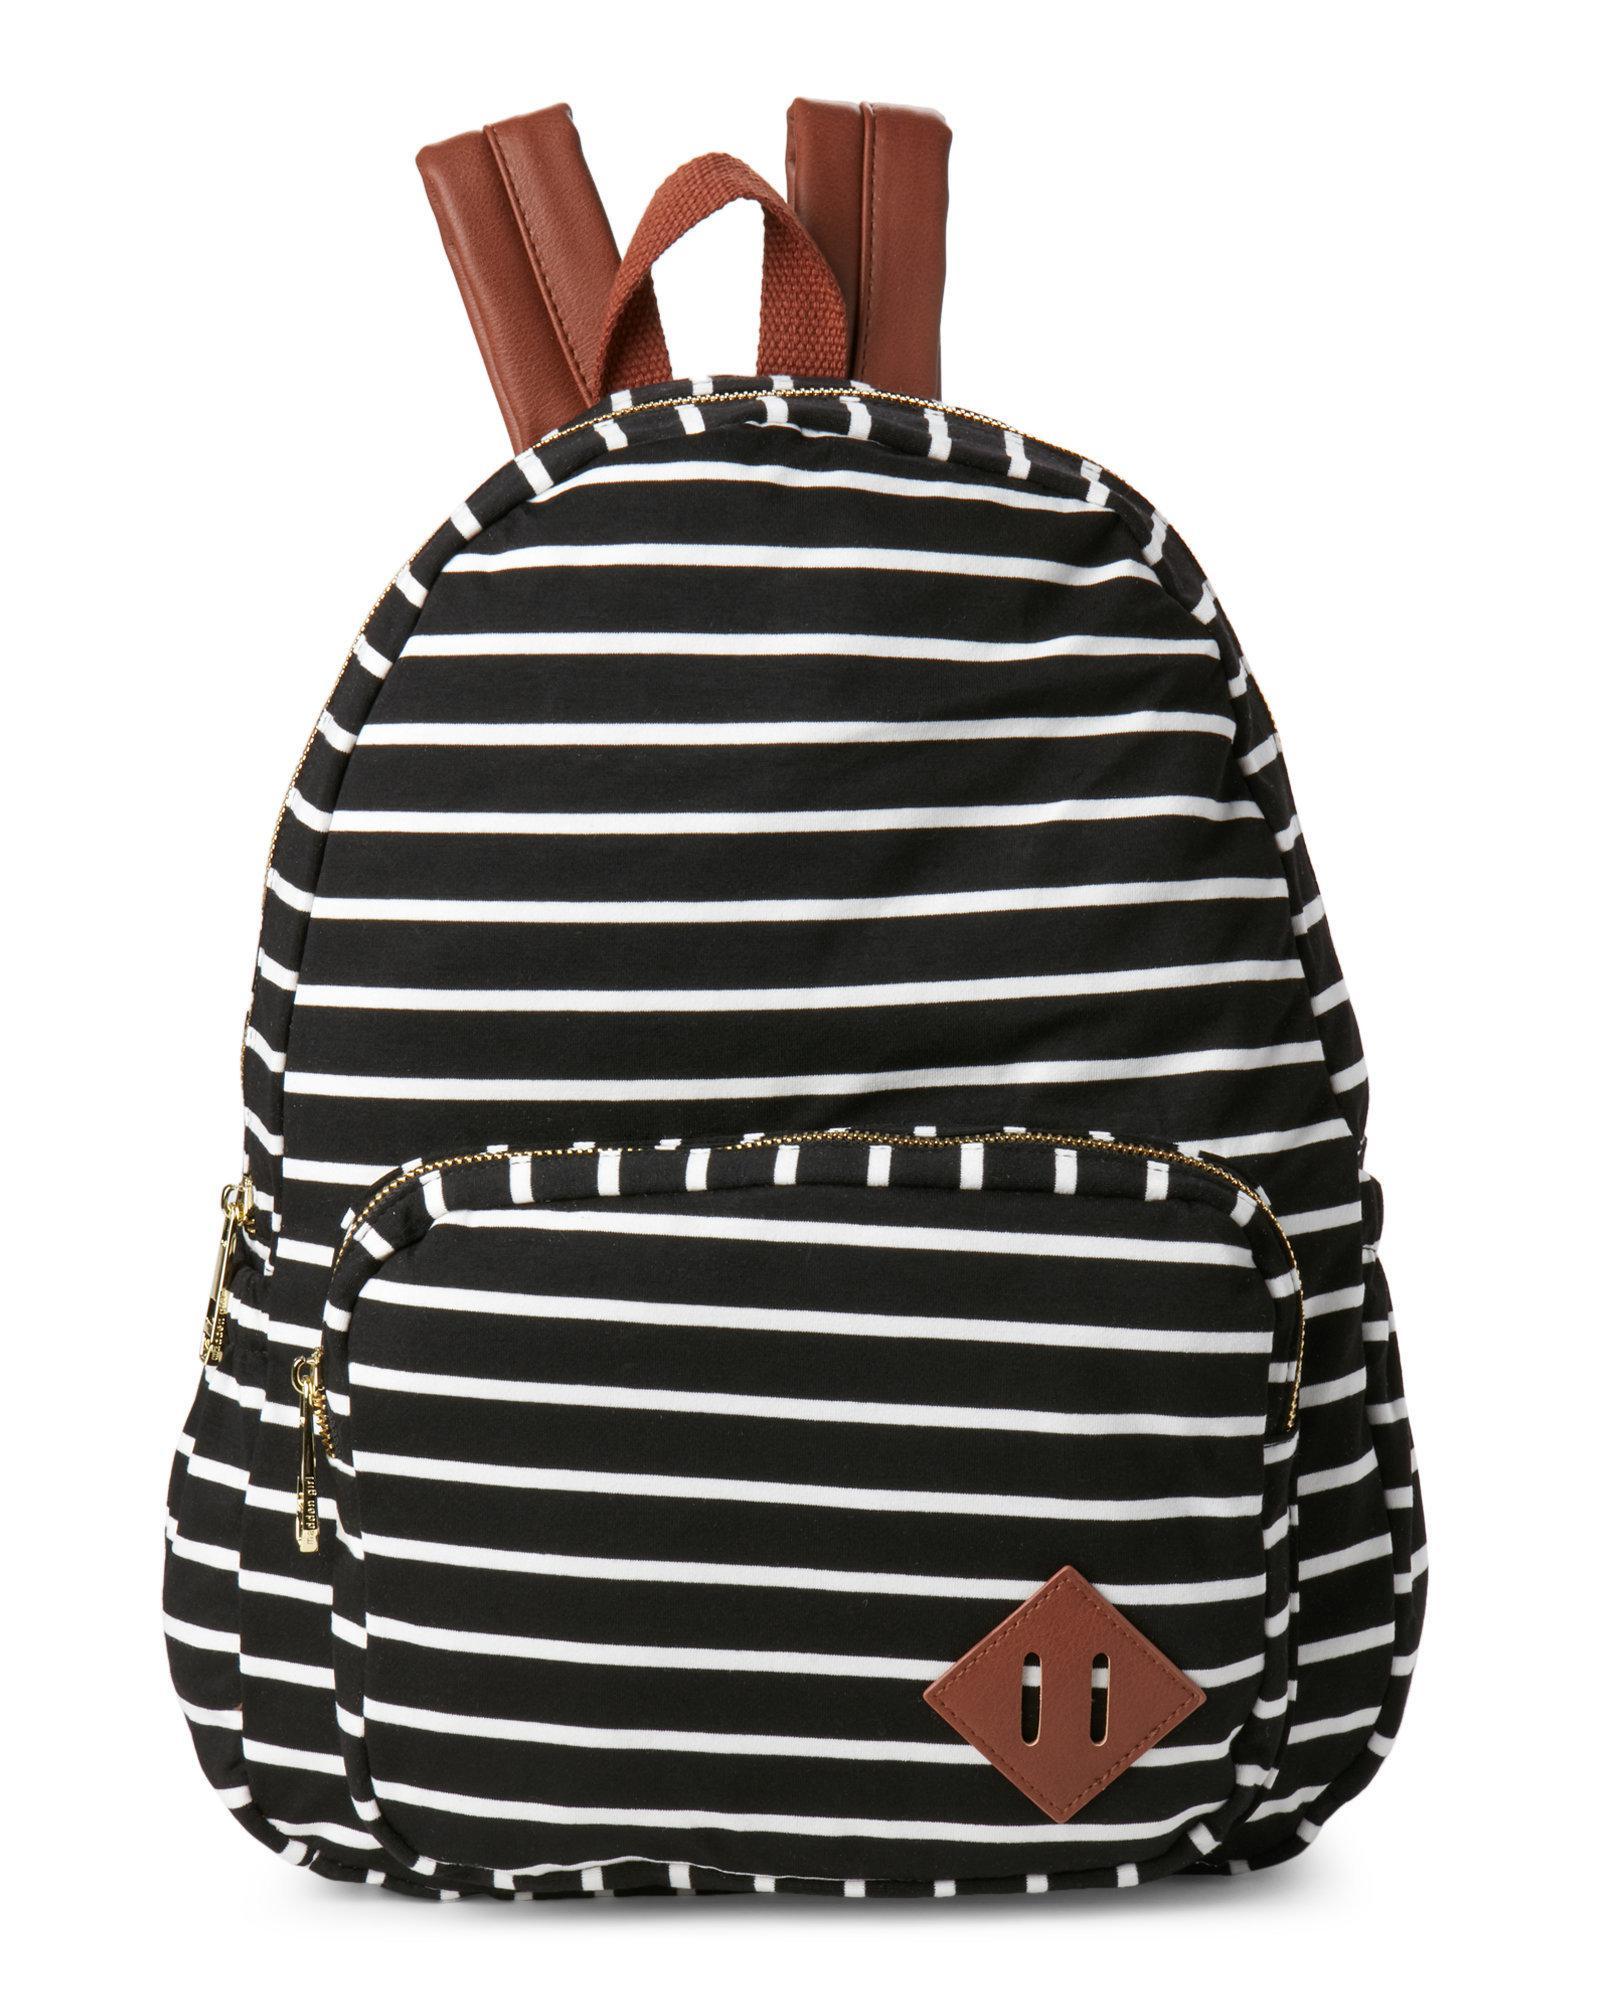 fea44041a5c Steve Madden Striped Jersey Backpack in Black - Lyst